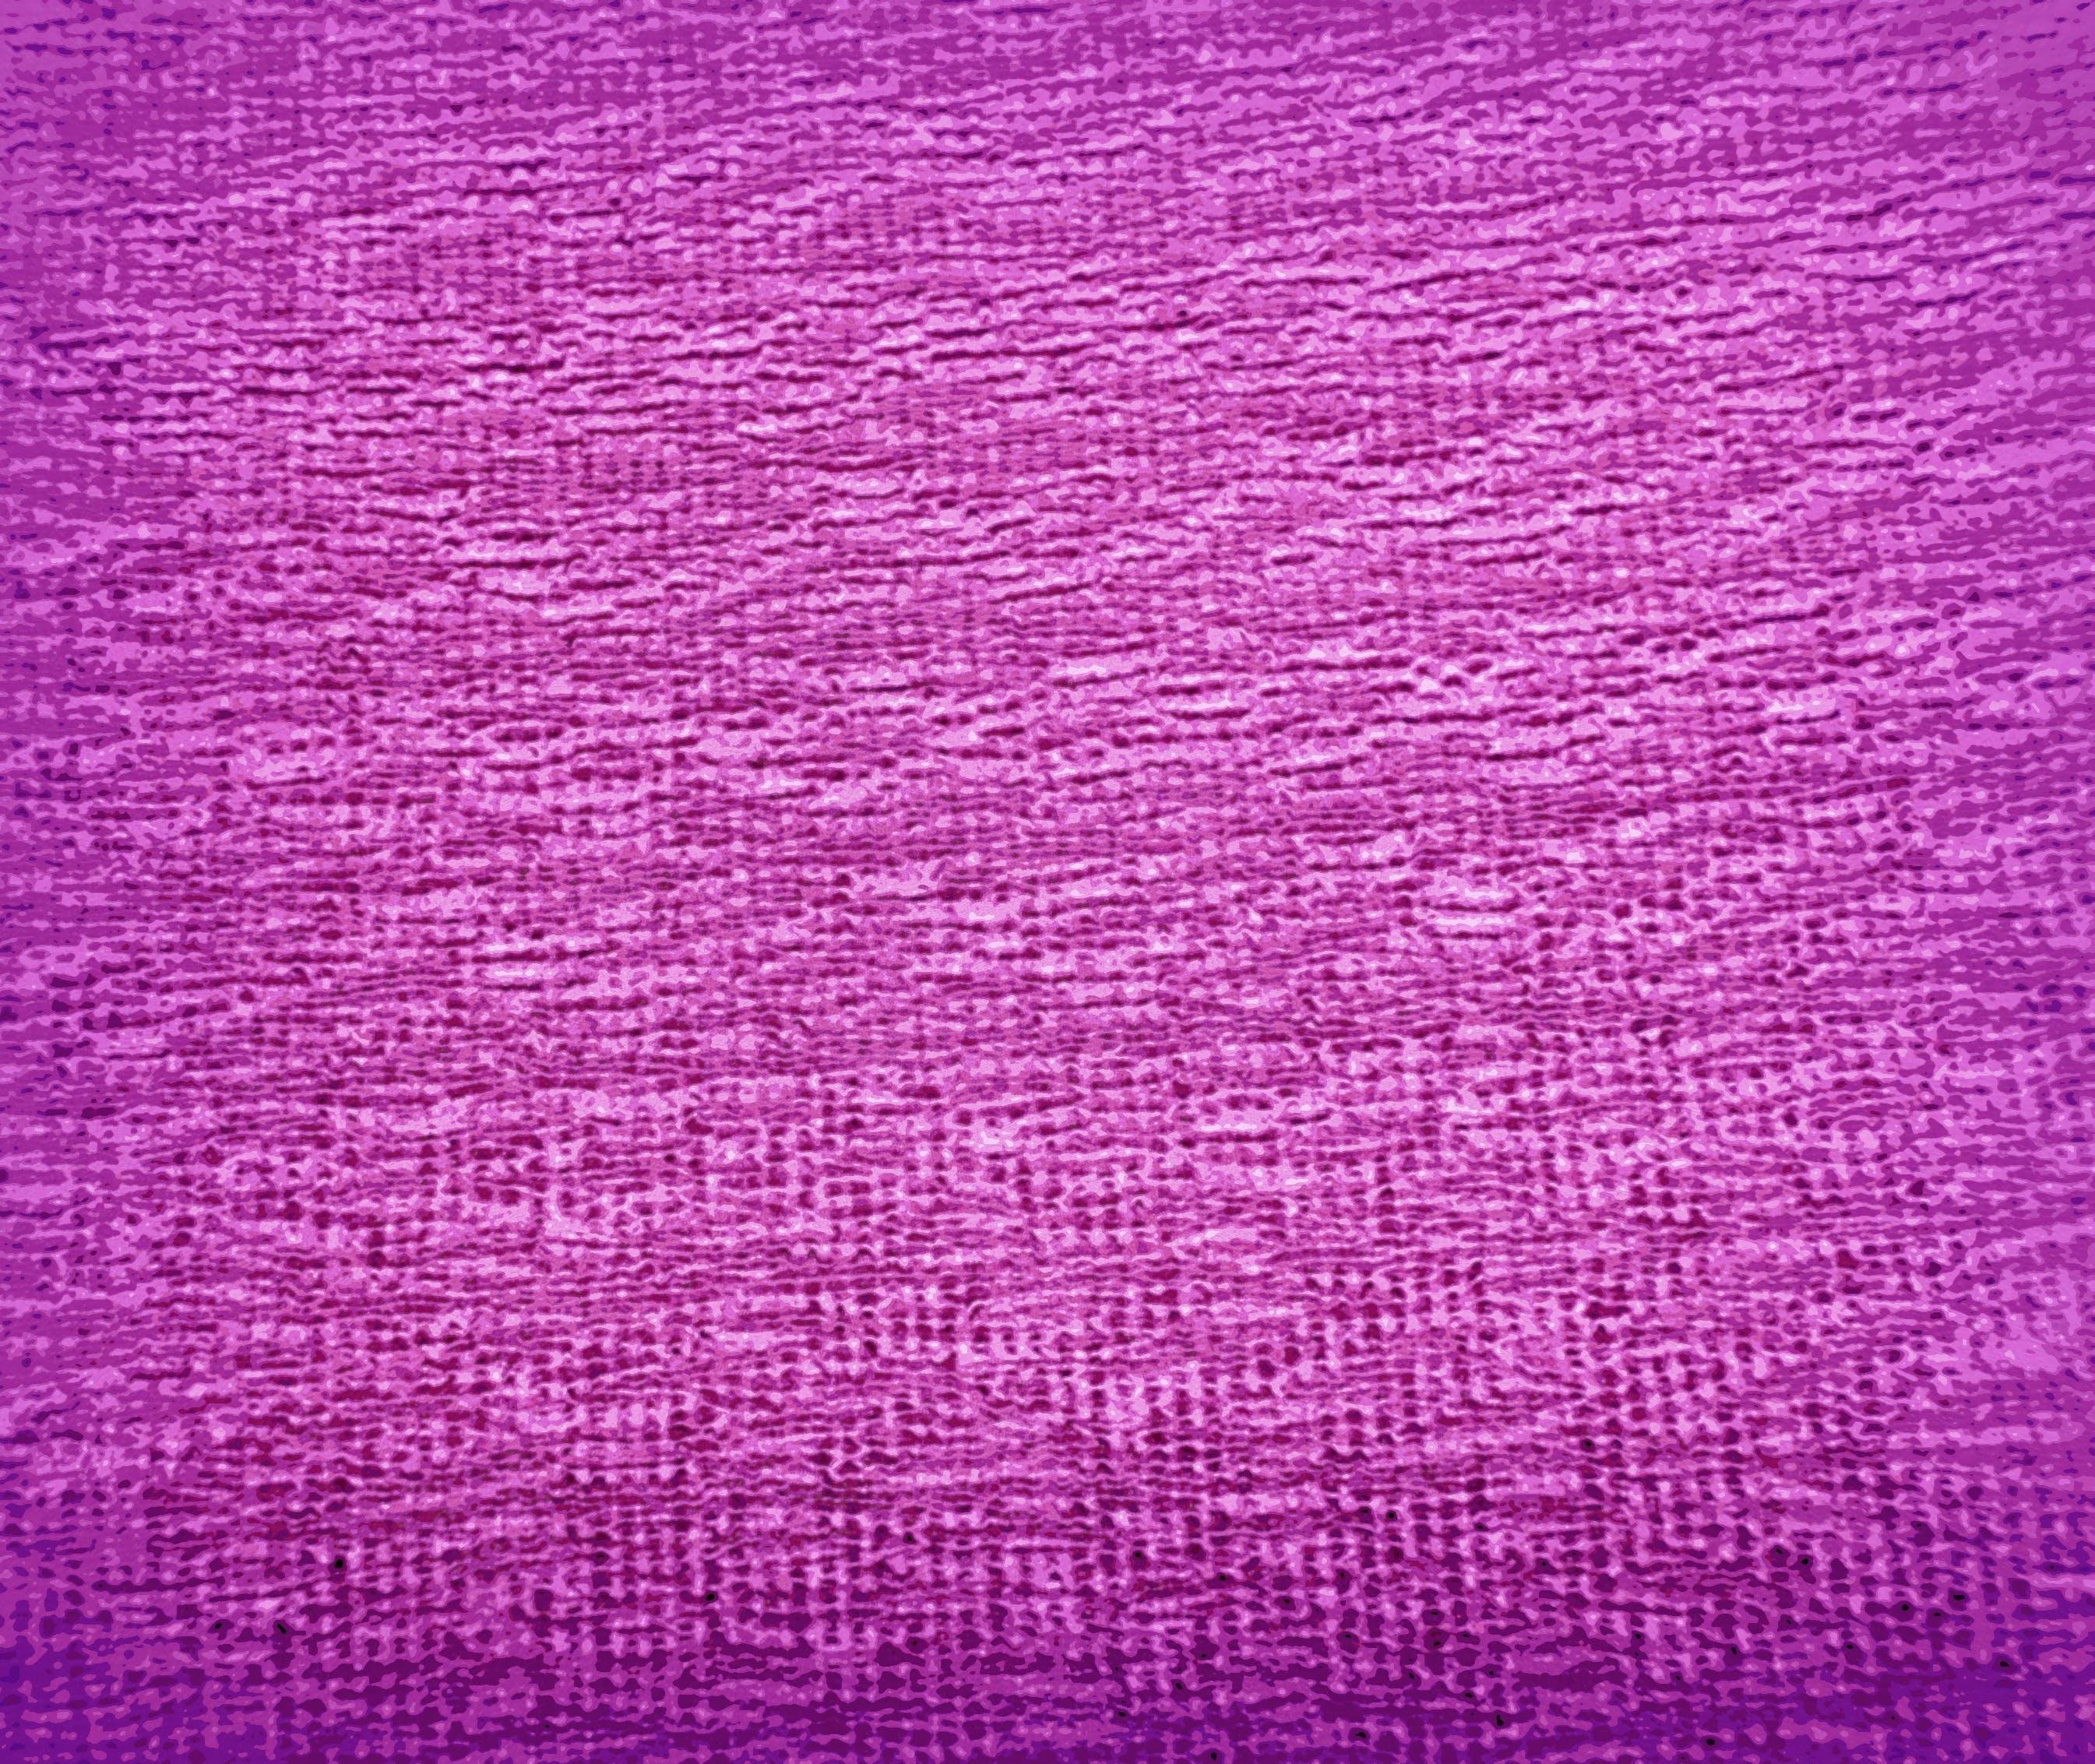 Free stock photo of background, fabric, purple, texture